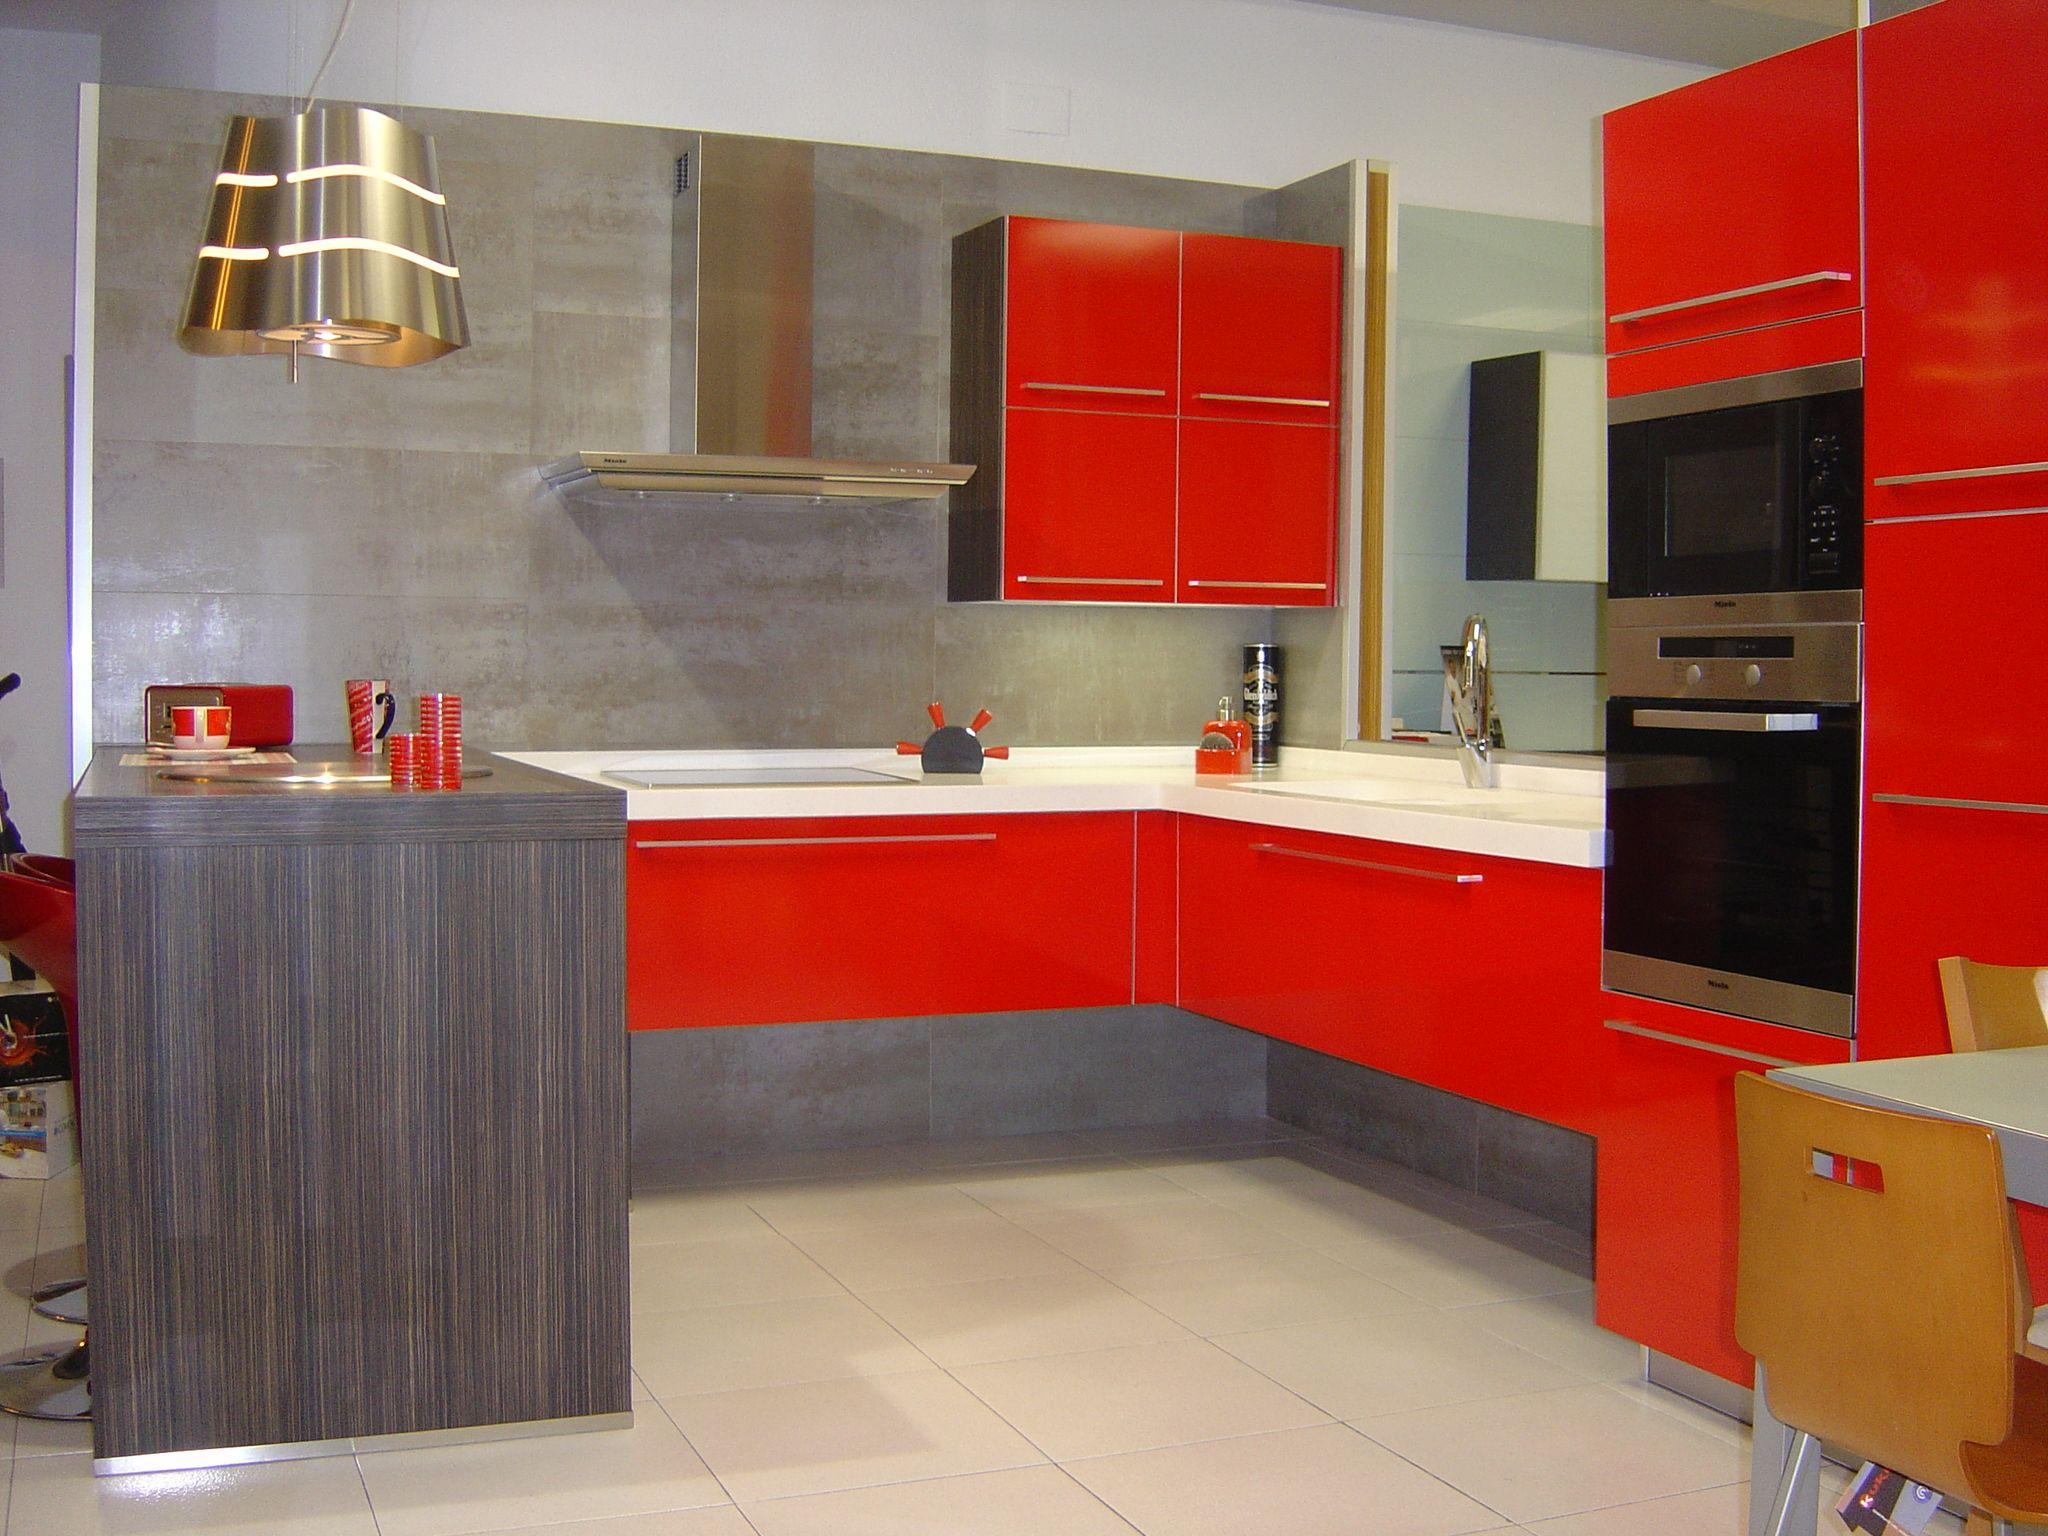 Cocina roja cocina cocinas rojas pinterest - Cocinas rojas ...